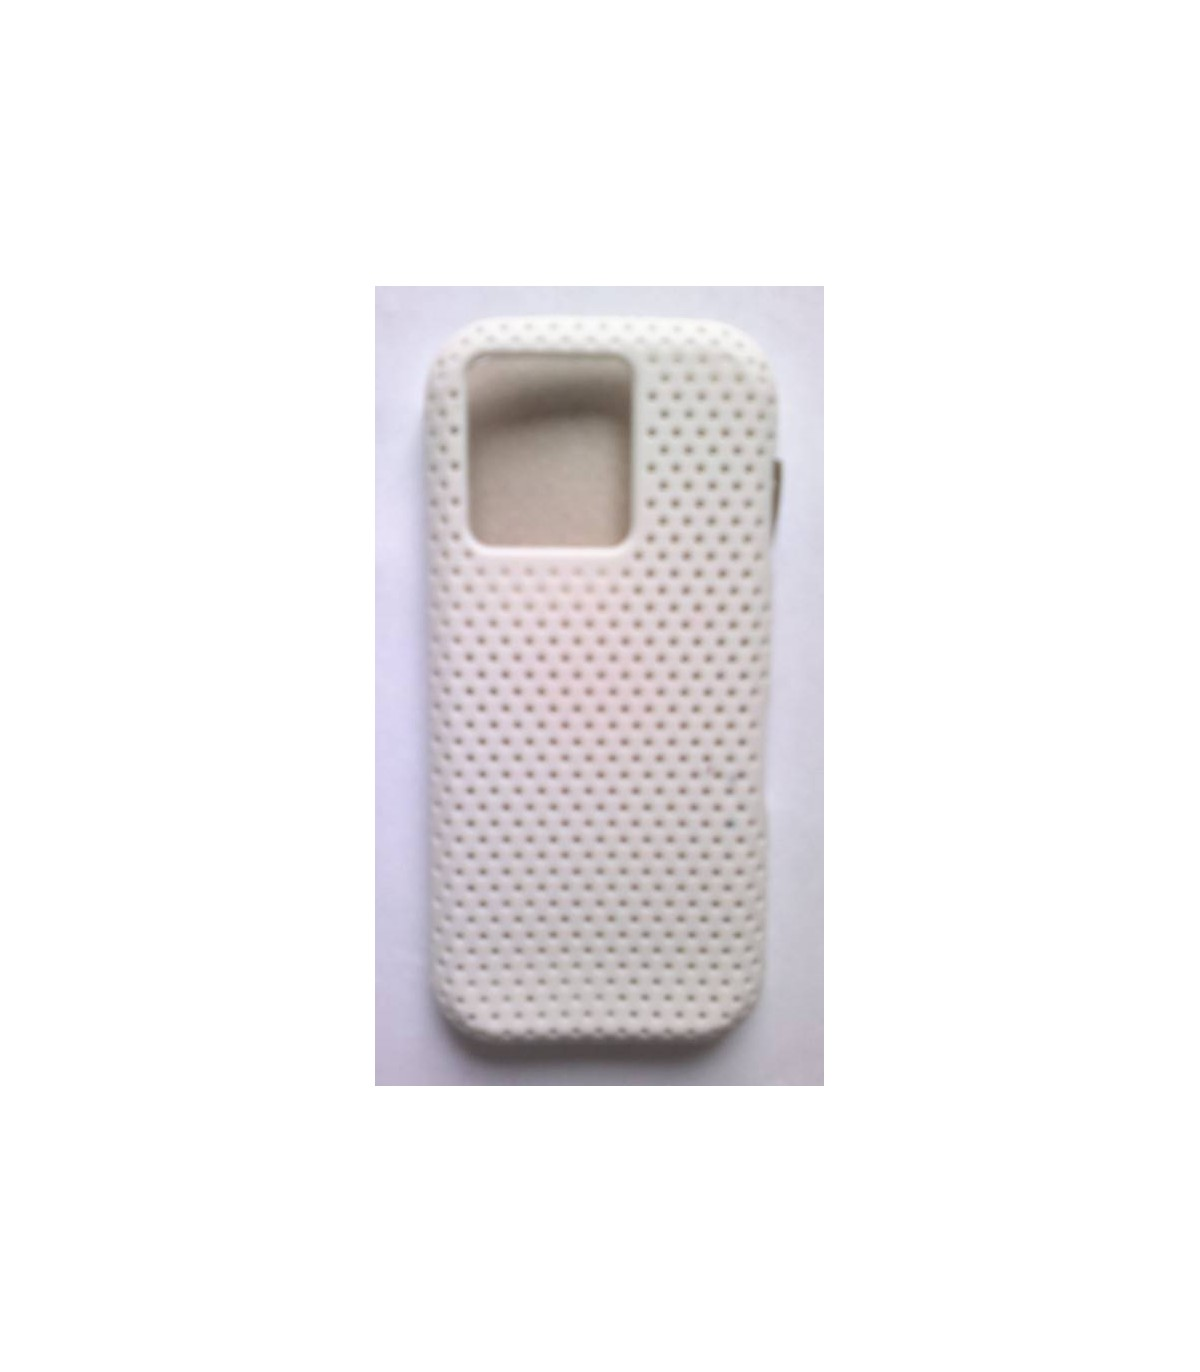 Funda Nokia N97 mini, Branca